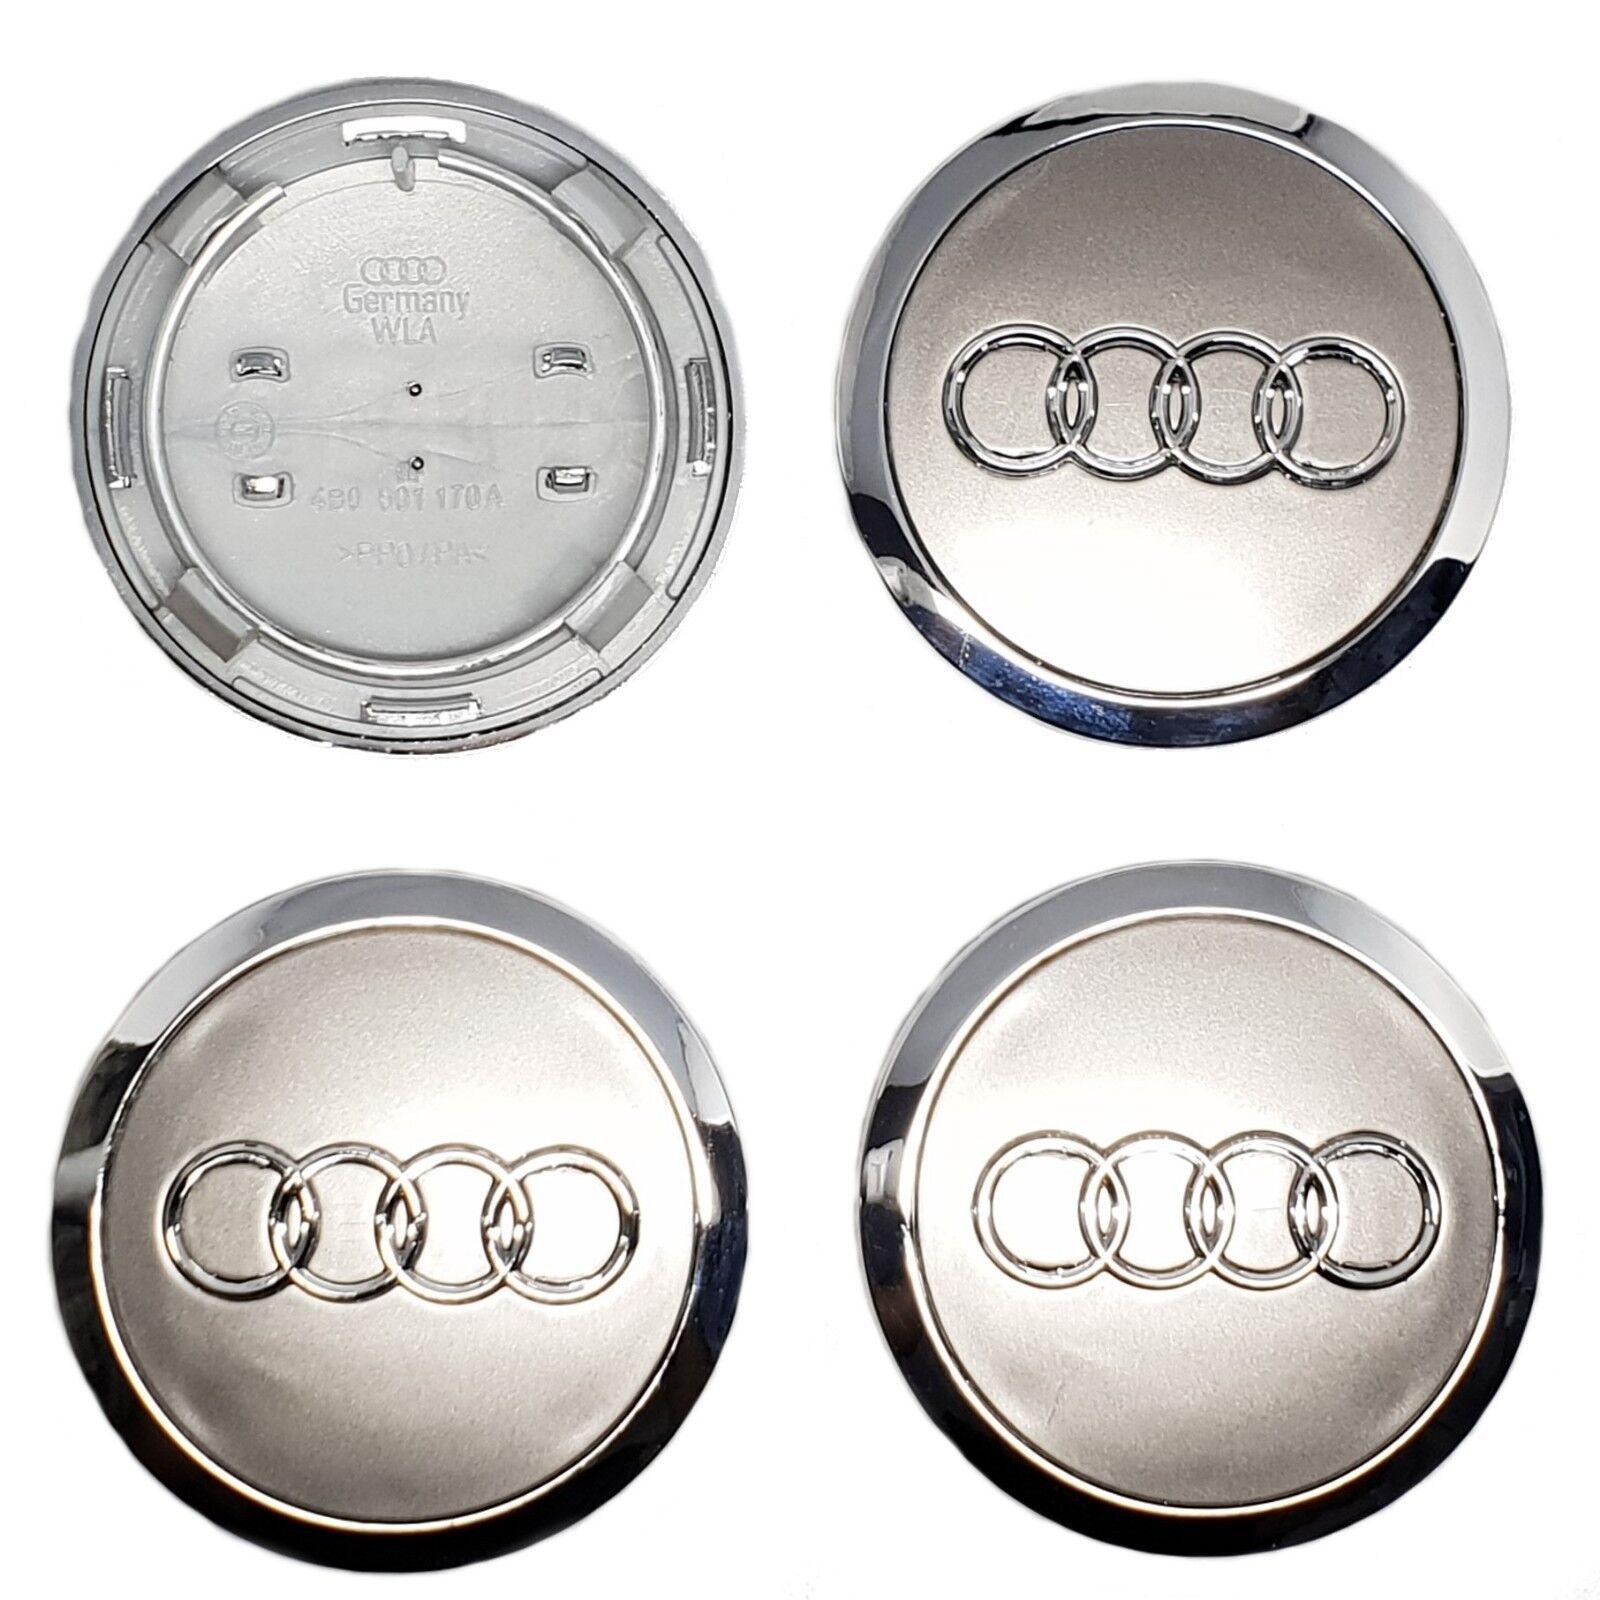 Audi Grey//Chrome Wheel Centre Caps 69 mm x4 for a3 a4 a5 TT q3 q5 q7 S LINE